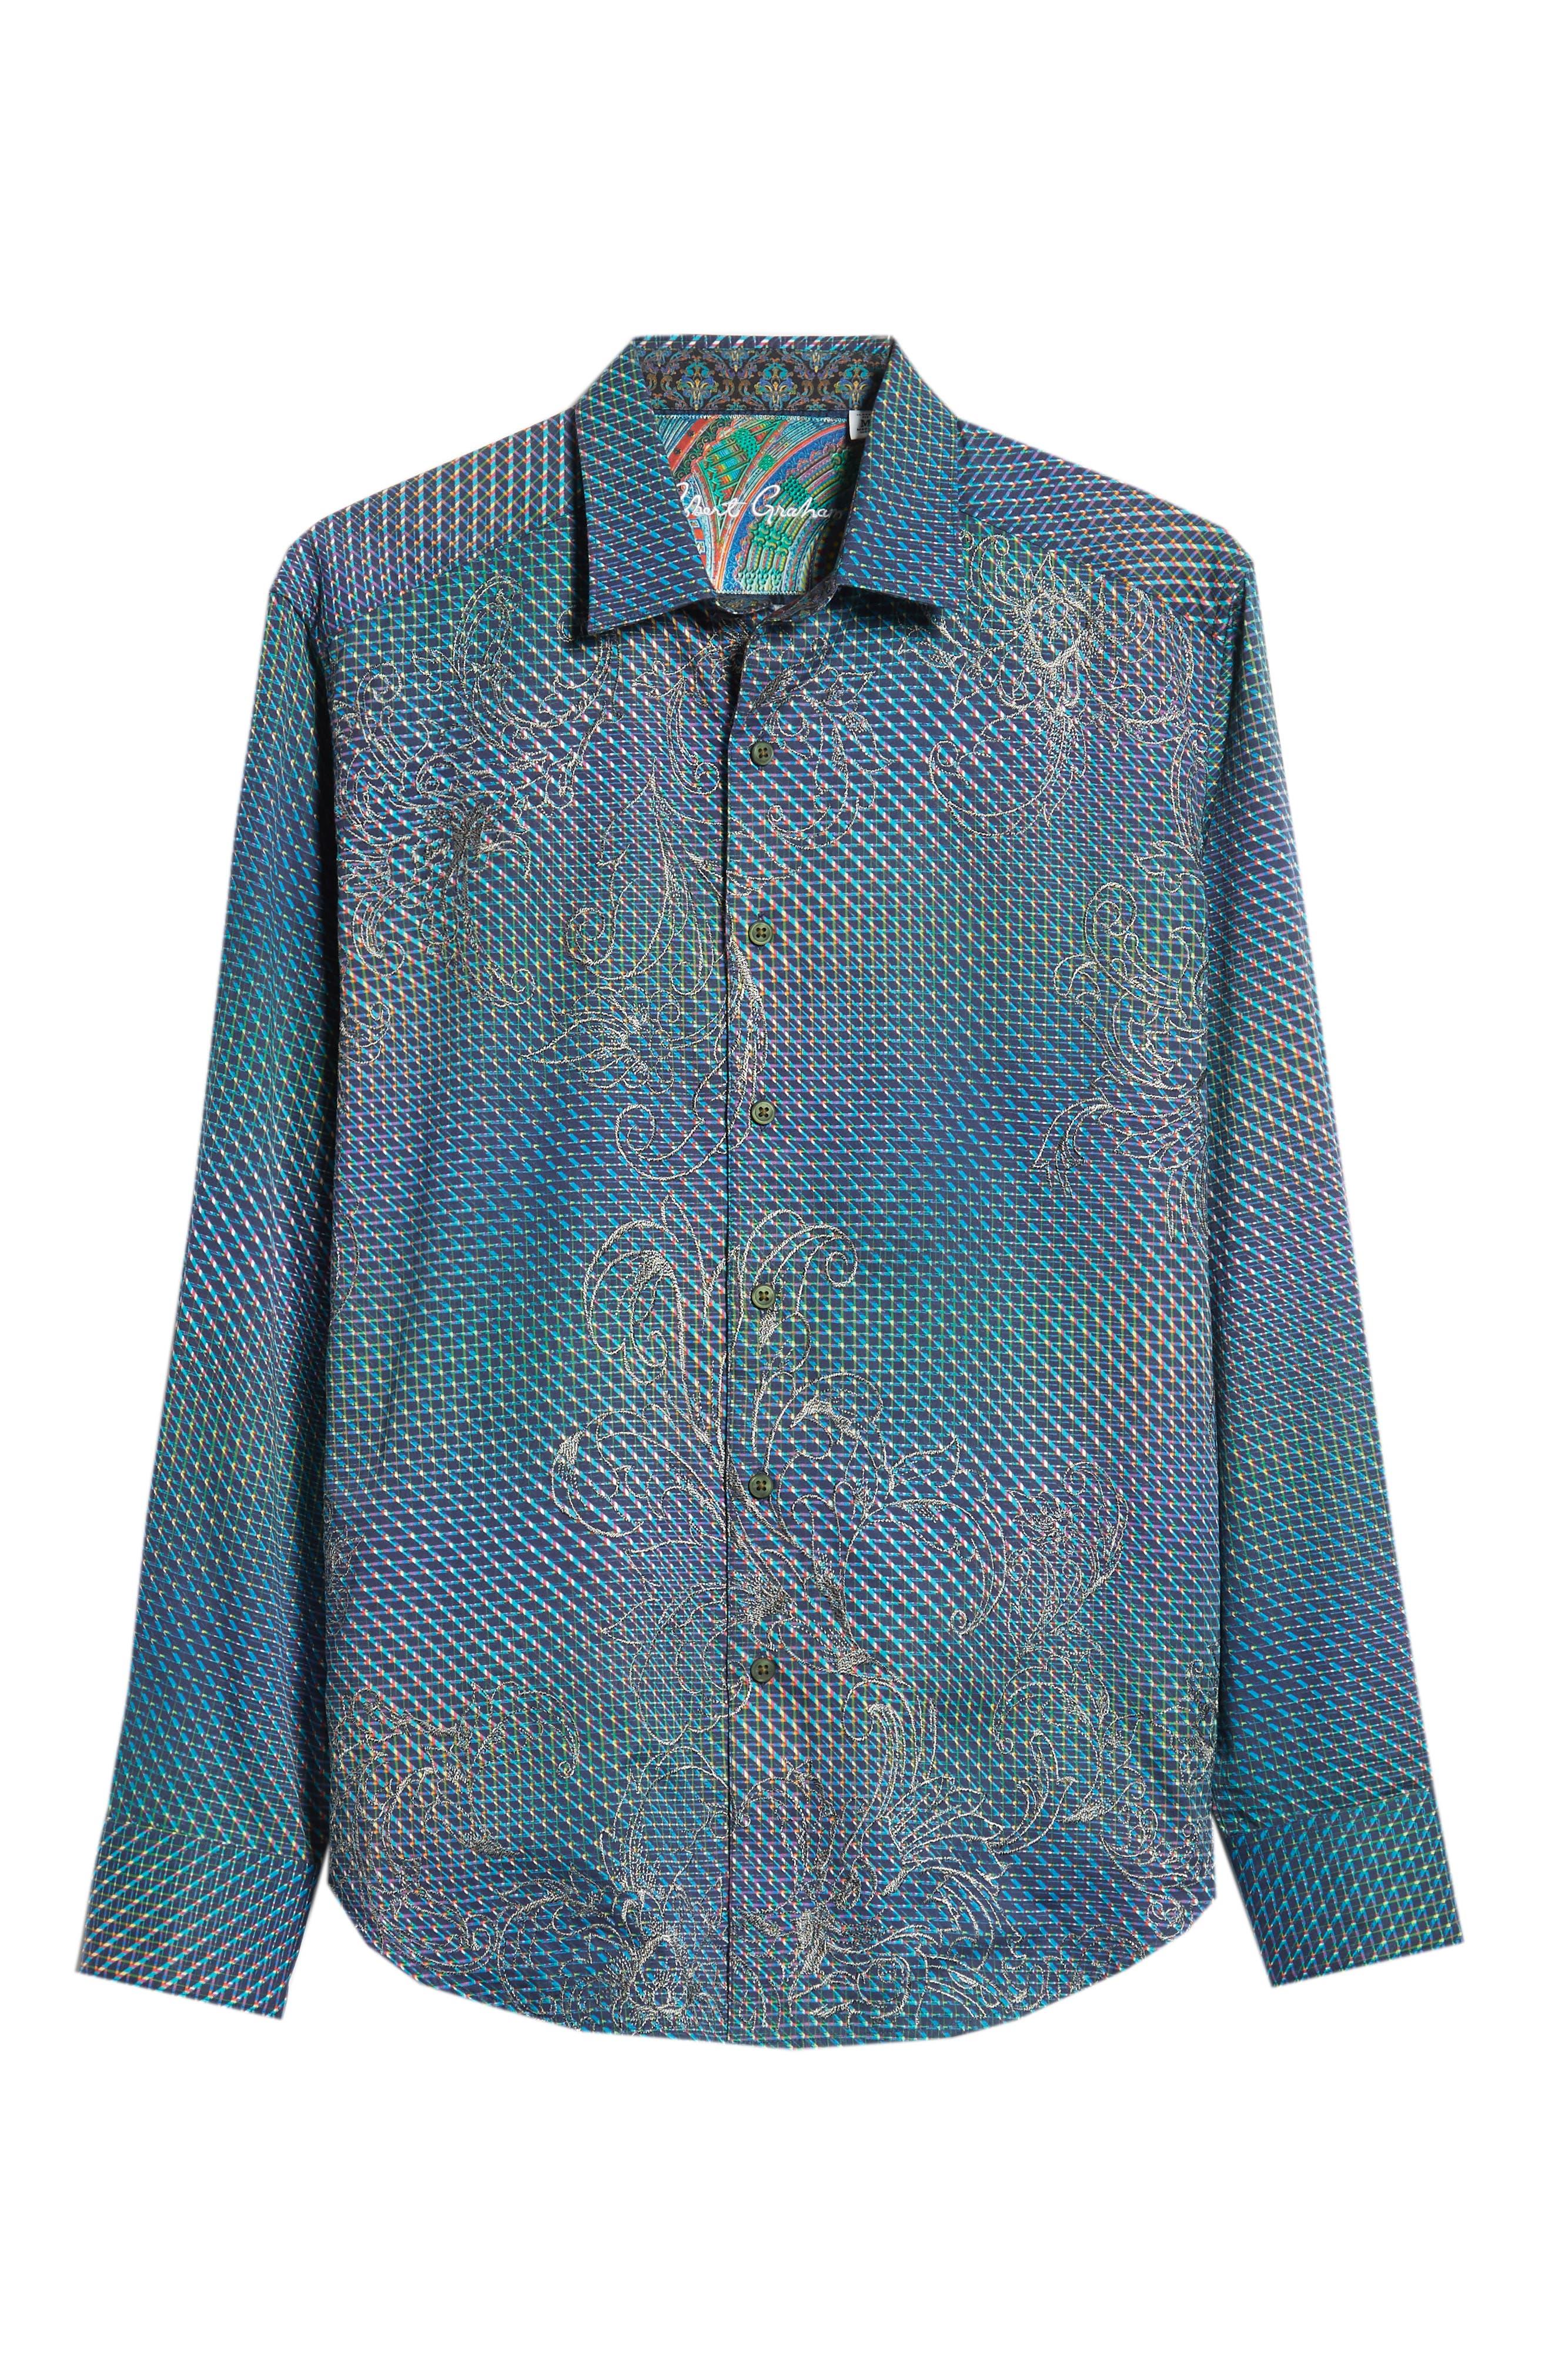 Marsh Classic Fit Sport Shirt,                             Alternate thumbnail 5, color,                             400